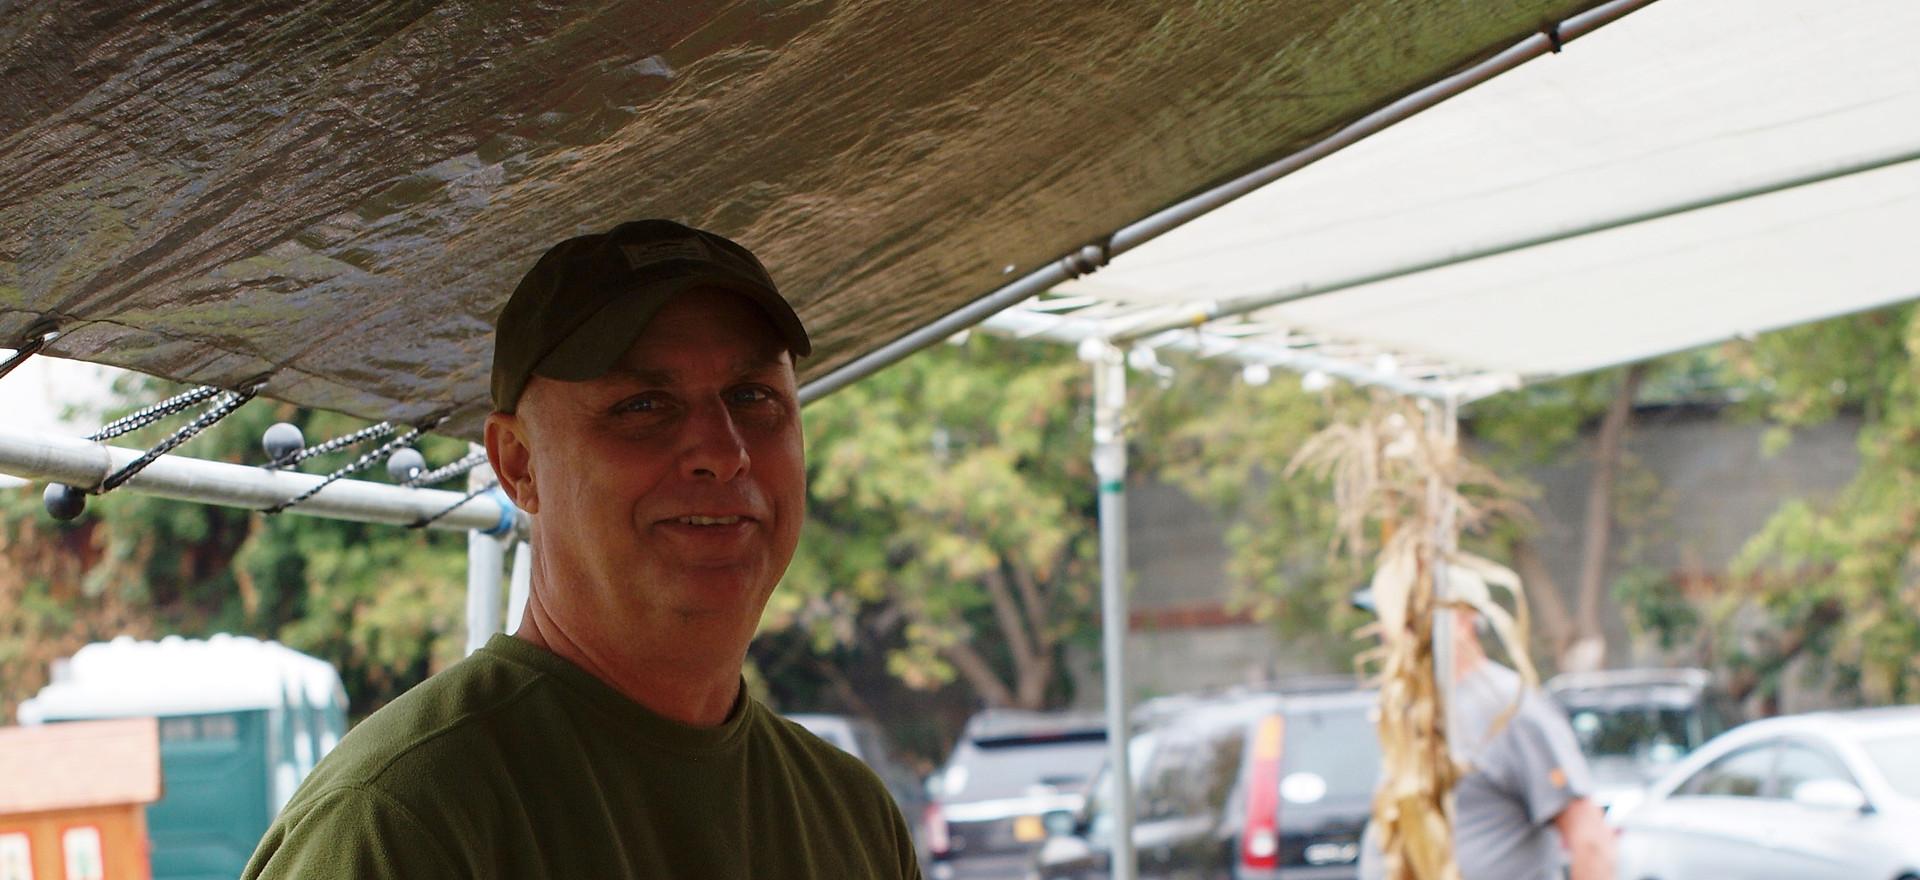 Keith Maziejka, volunteer